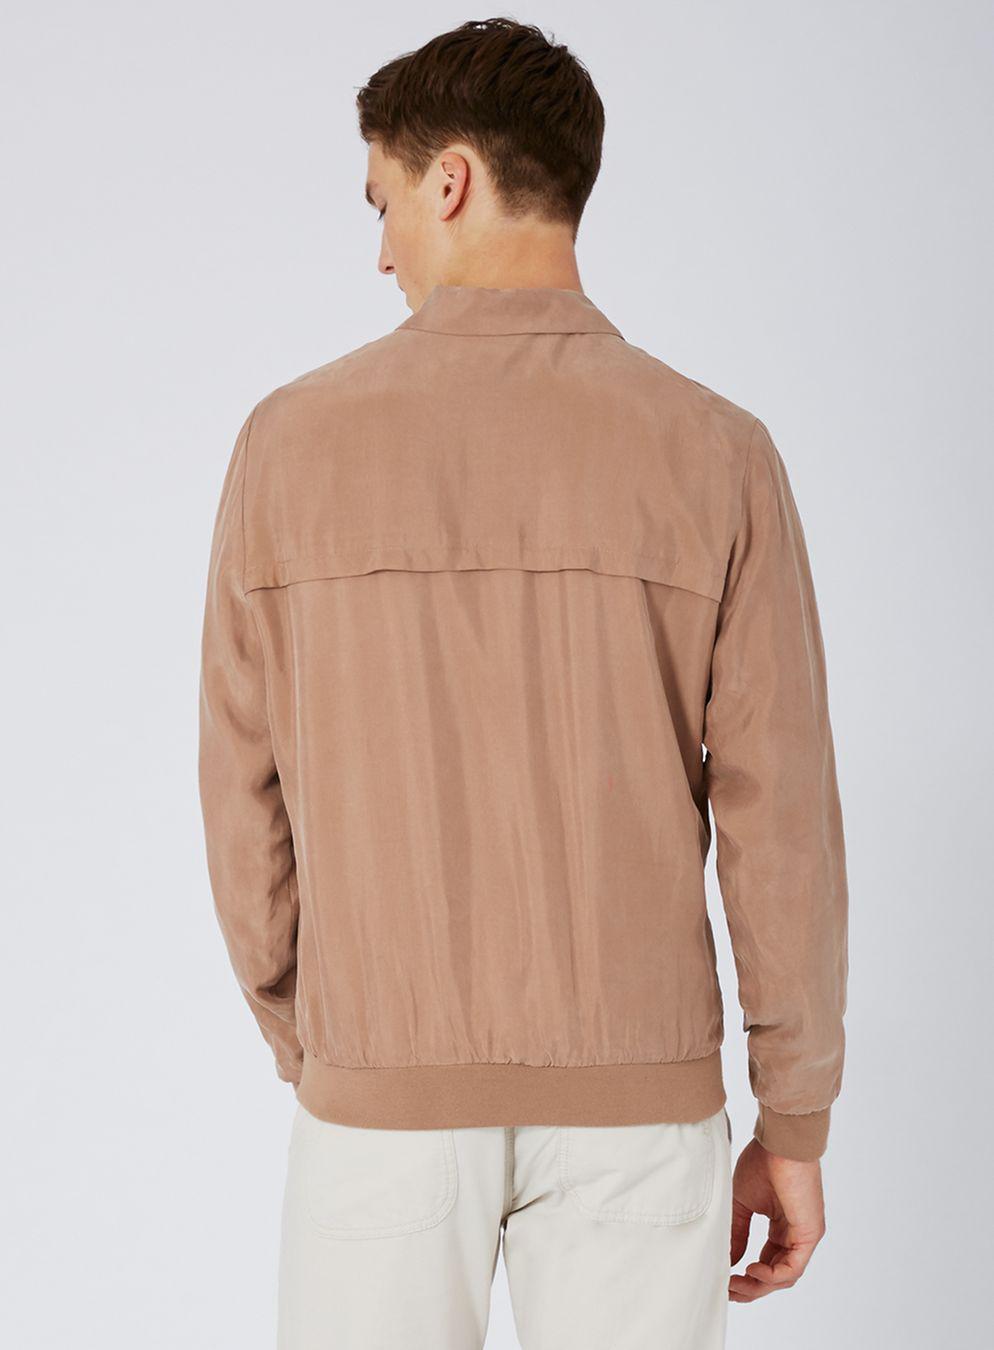 TOPMAN Synthetic Pink Smart Bomber Jacket for Men